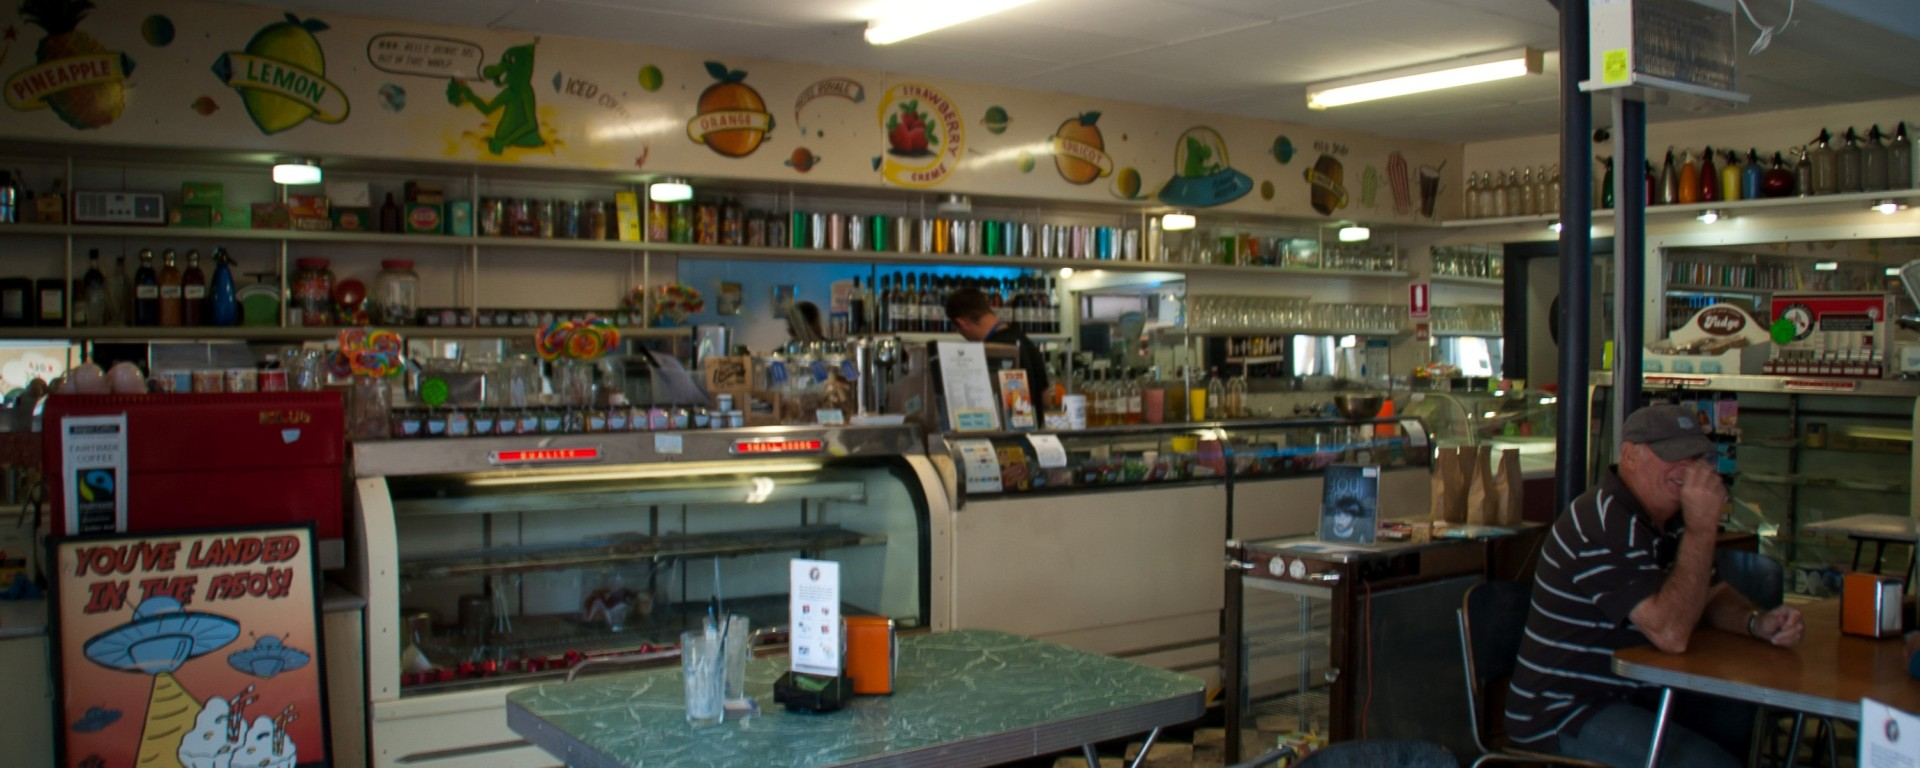 Bell's Milk Bar, Broken Hill, NSW